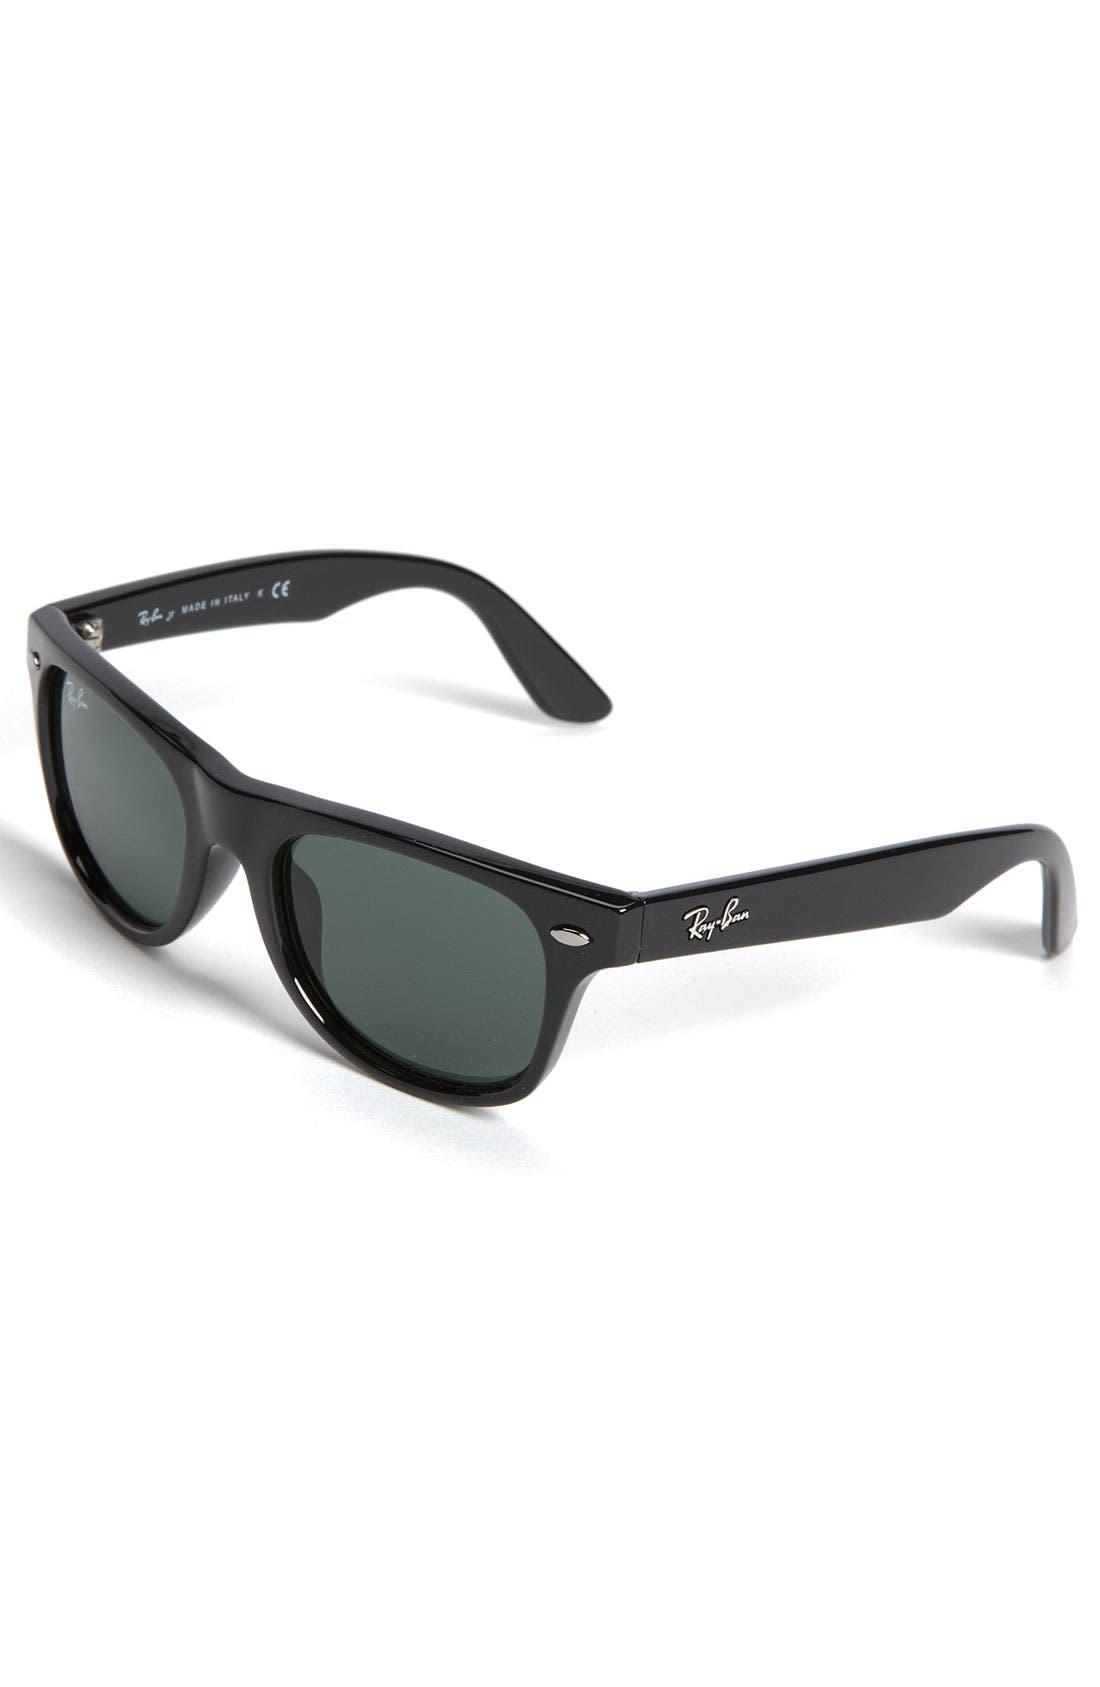 Alternate Image 1 Selected - Ray-Ban Wayfarer 44mm Sunglasses (Boys)